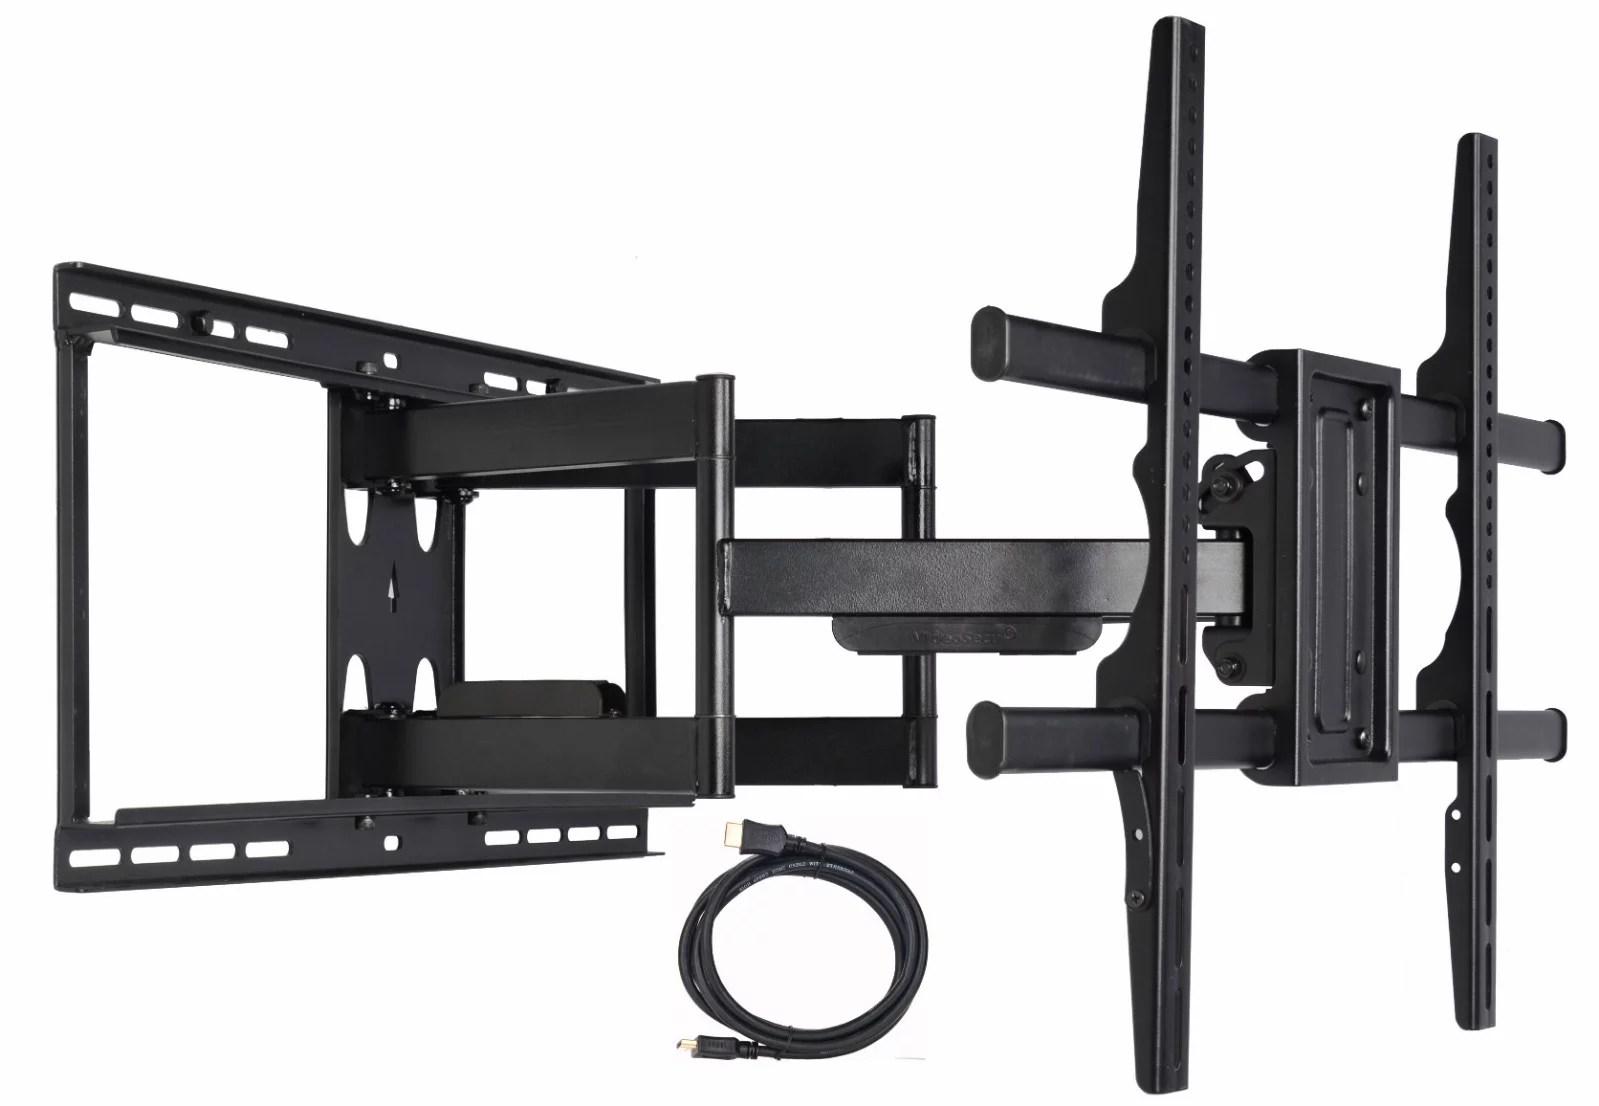 videosecu articulating full motion tv wall mount for lg 55 60 65 75 86 inch led lcd plasma hdtv 60uj6300 60uj6540 65uh6030 65uh6150 75sj8570 75uh8500